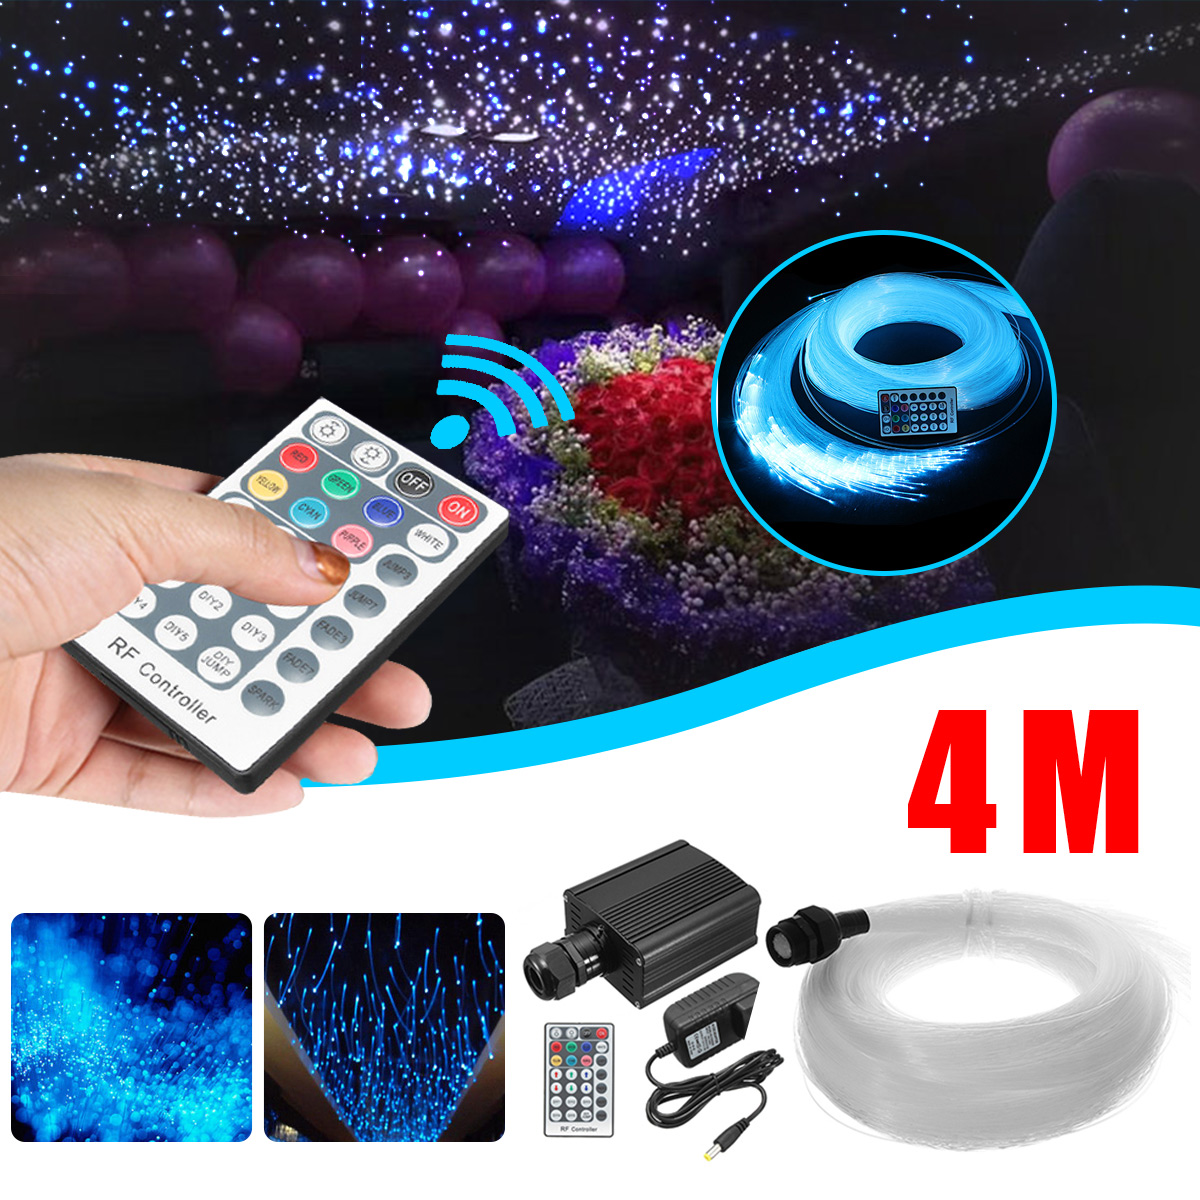 28 Key Wireless RF LED Fiber Optic Twinkle 16W RGBW Engine 4mx0.75mmx250Pc+15x1mm+Crystal Optical Fiber Starry Sky Ceiling Light